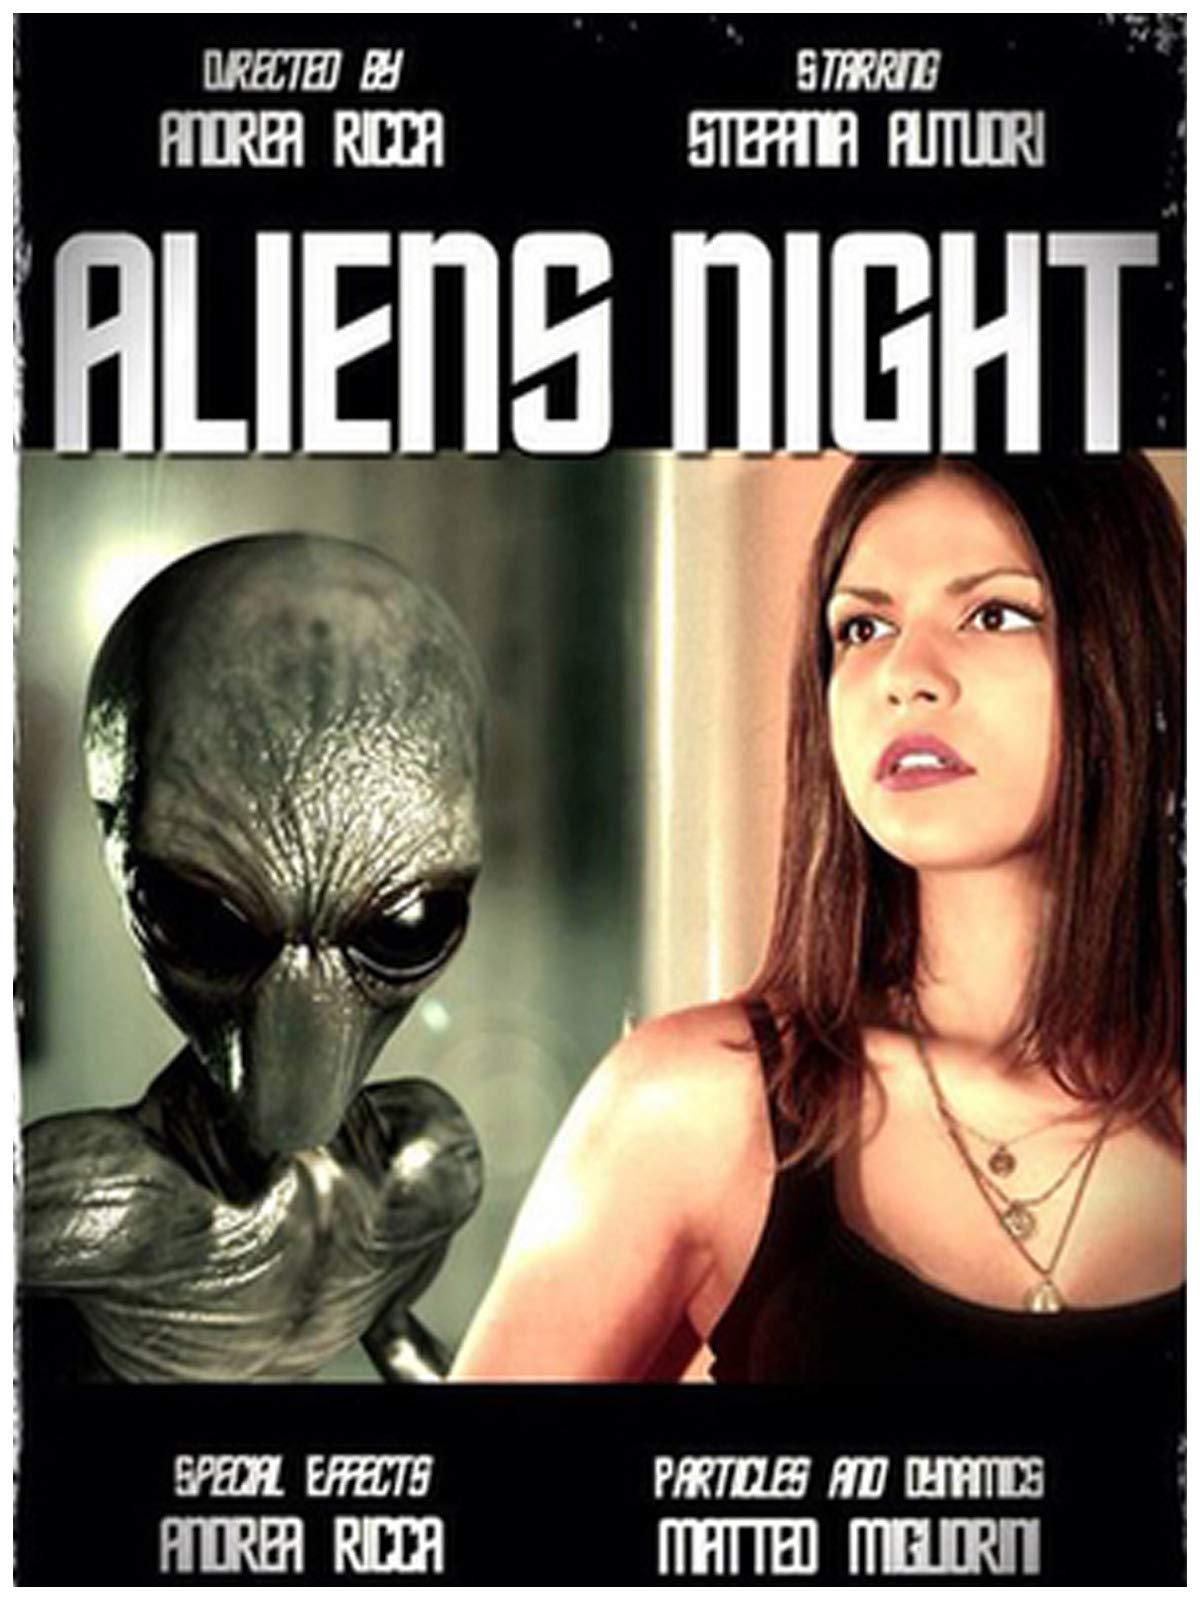 aliens night abducao alienigena curta metragem ficcao cientifica dirigido por adrea ricca - ALIENS NIGHT | Abdução Alienígena em Curta-metragem de ficção científica dirigido por Andrea Ricca